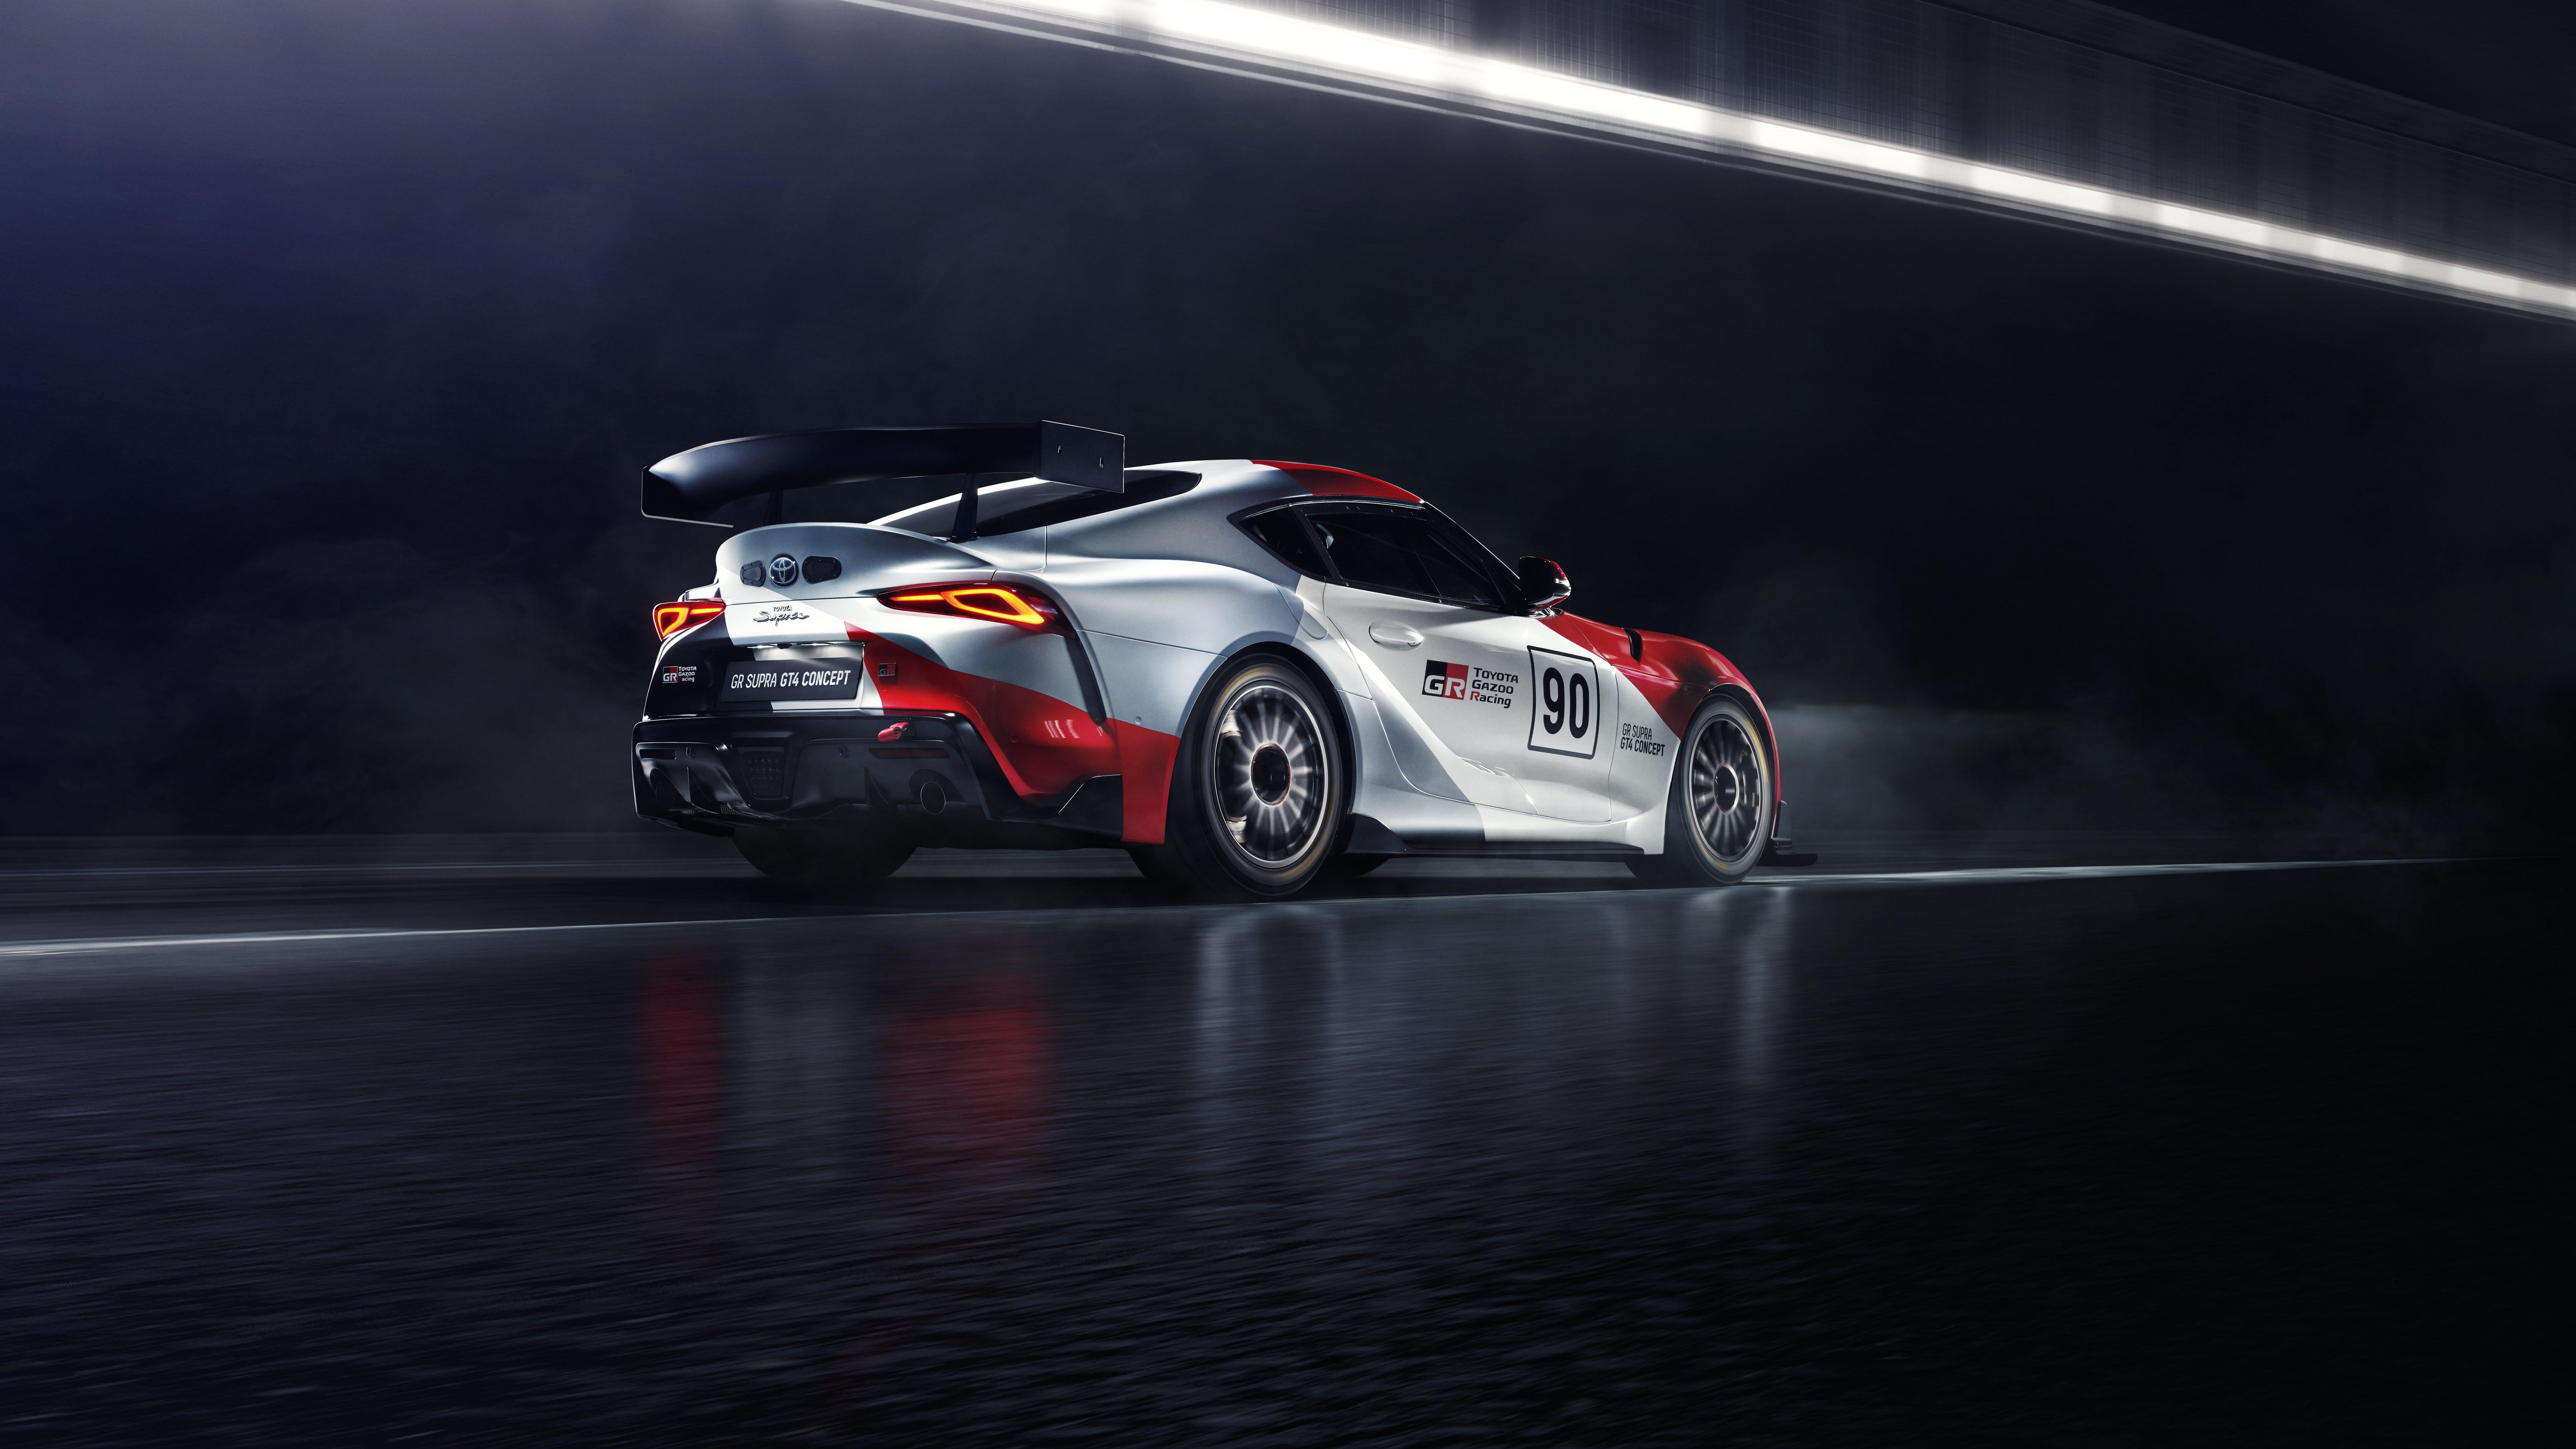 Wallpaper Toyota GR Supra GT4 2019 Cars Geneva Motor Show 2019 7680x4320